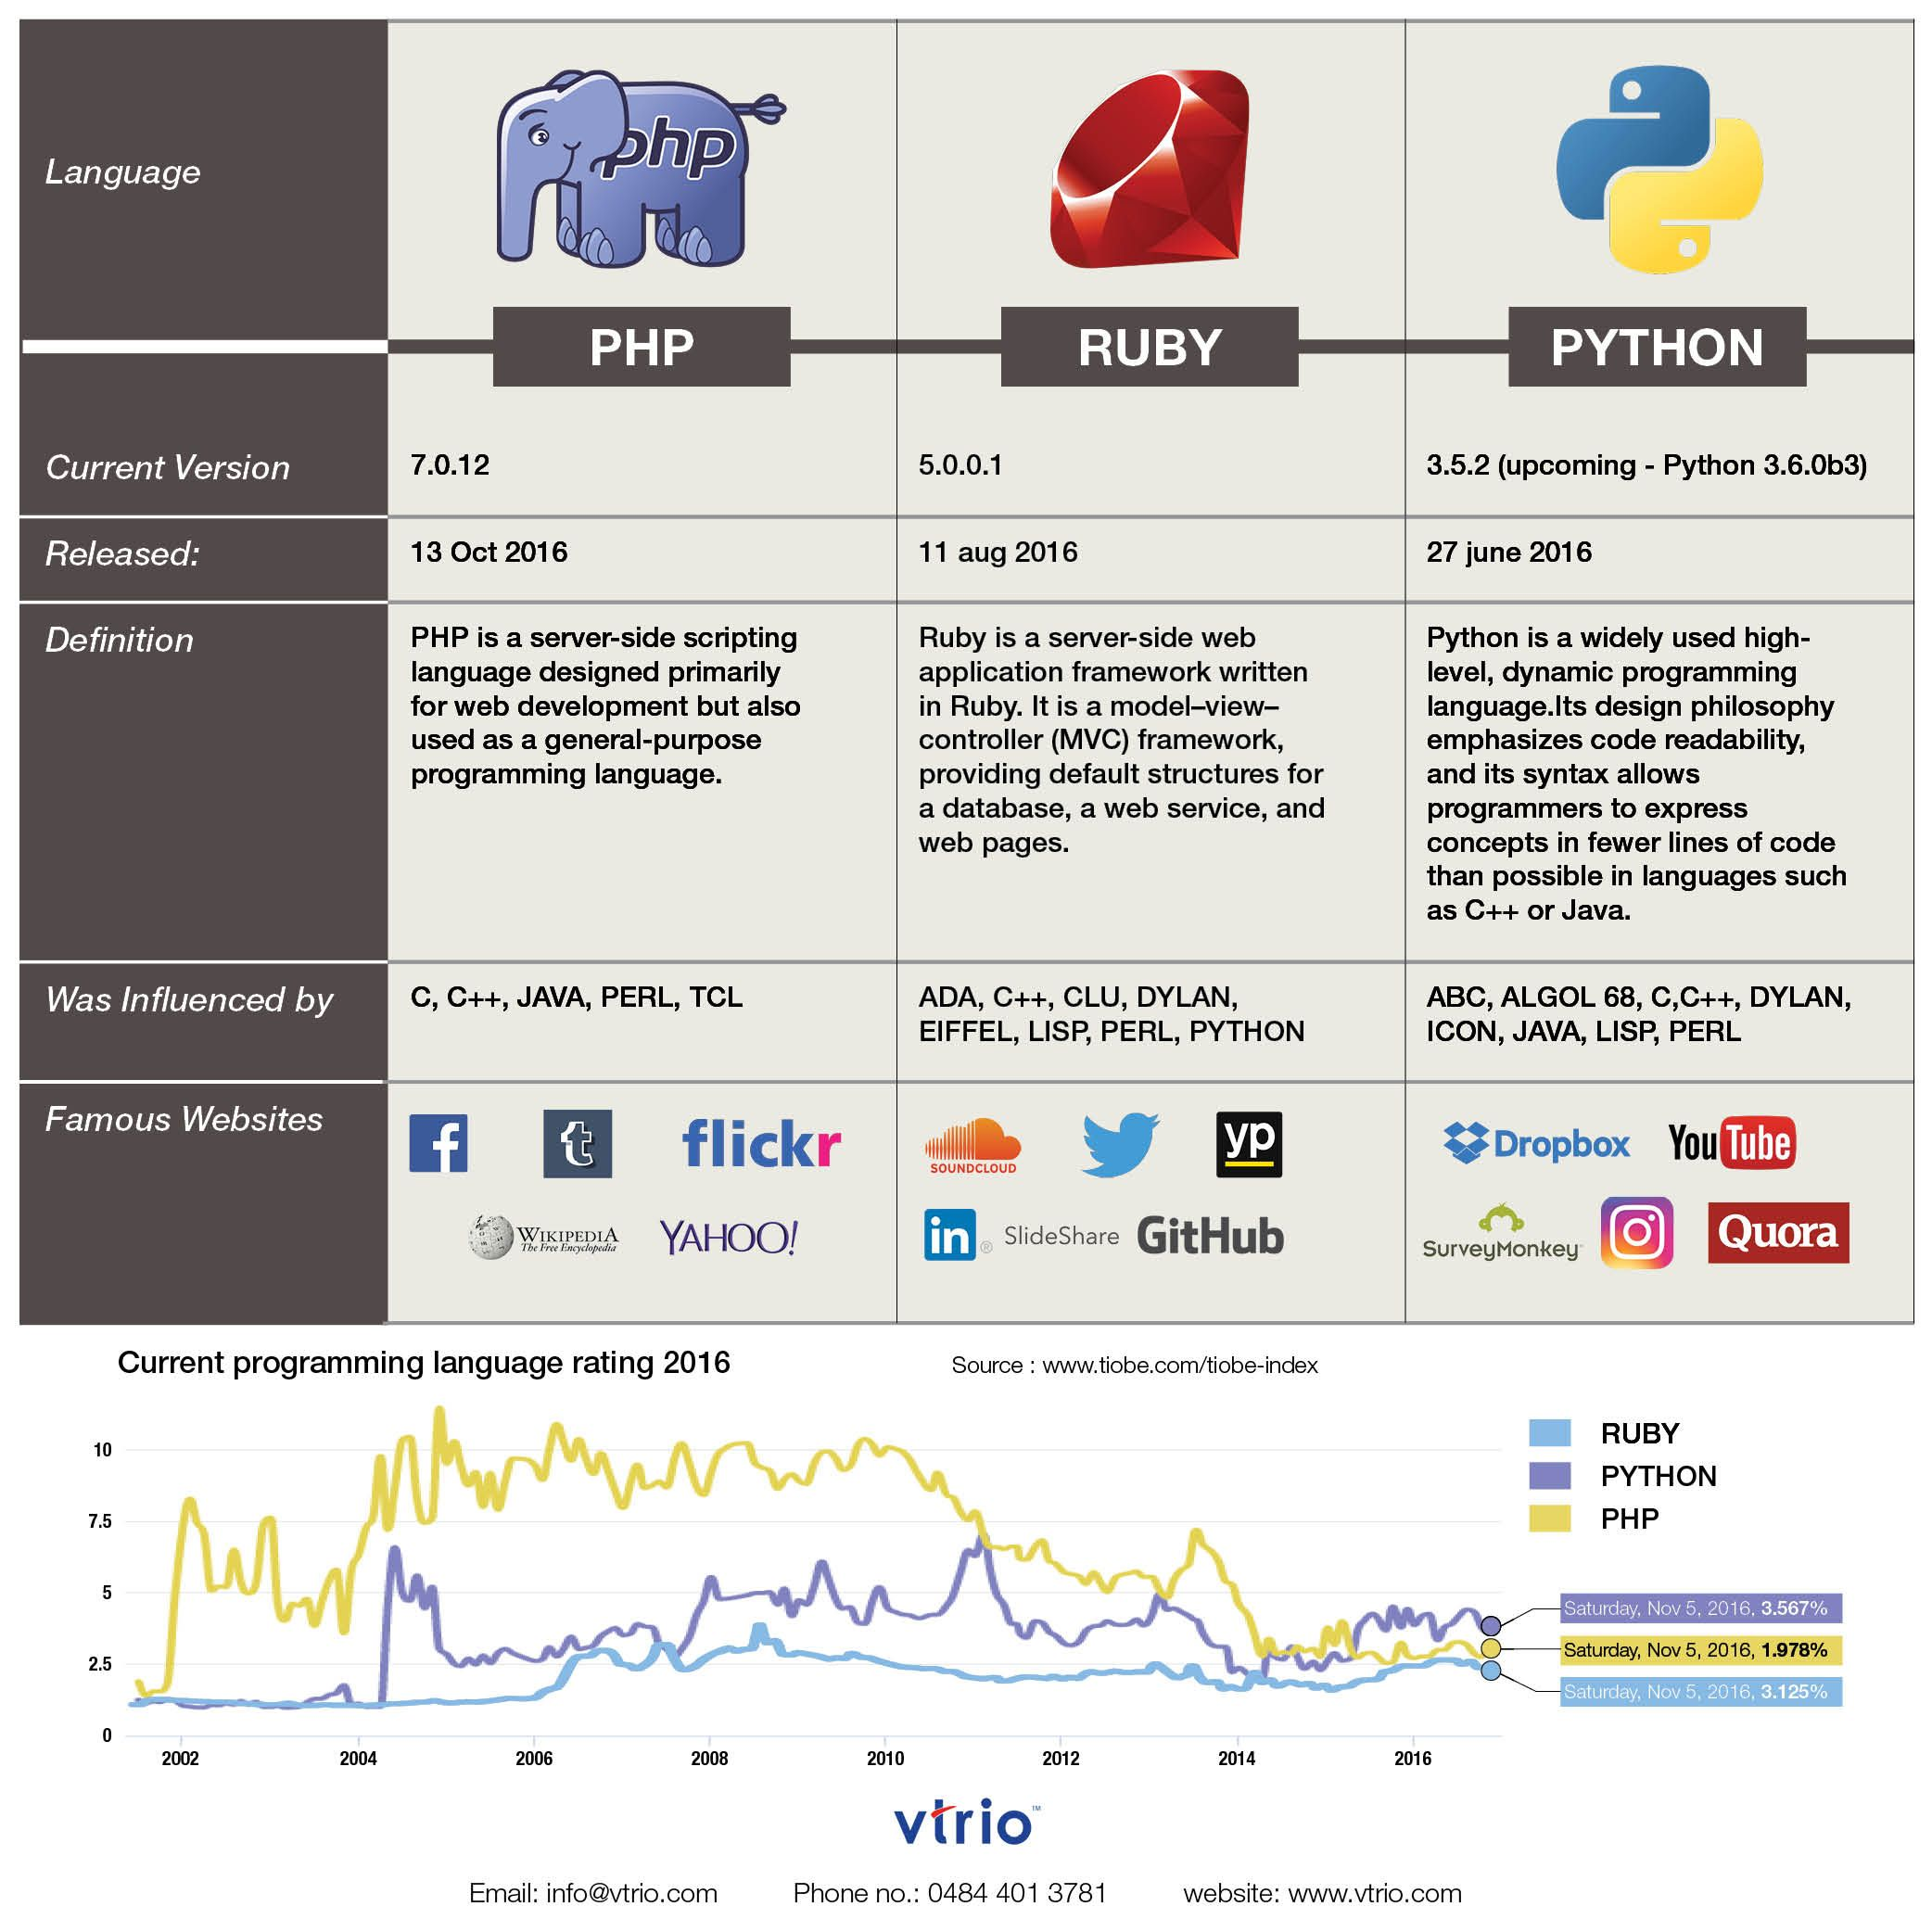 PHP vs Ruby vs Python - Current Programming Language rating